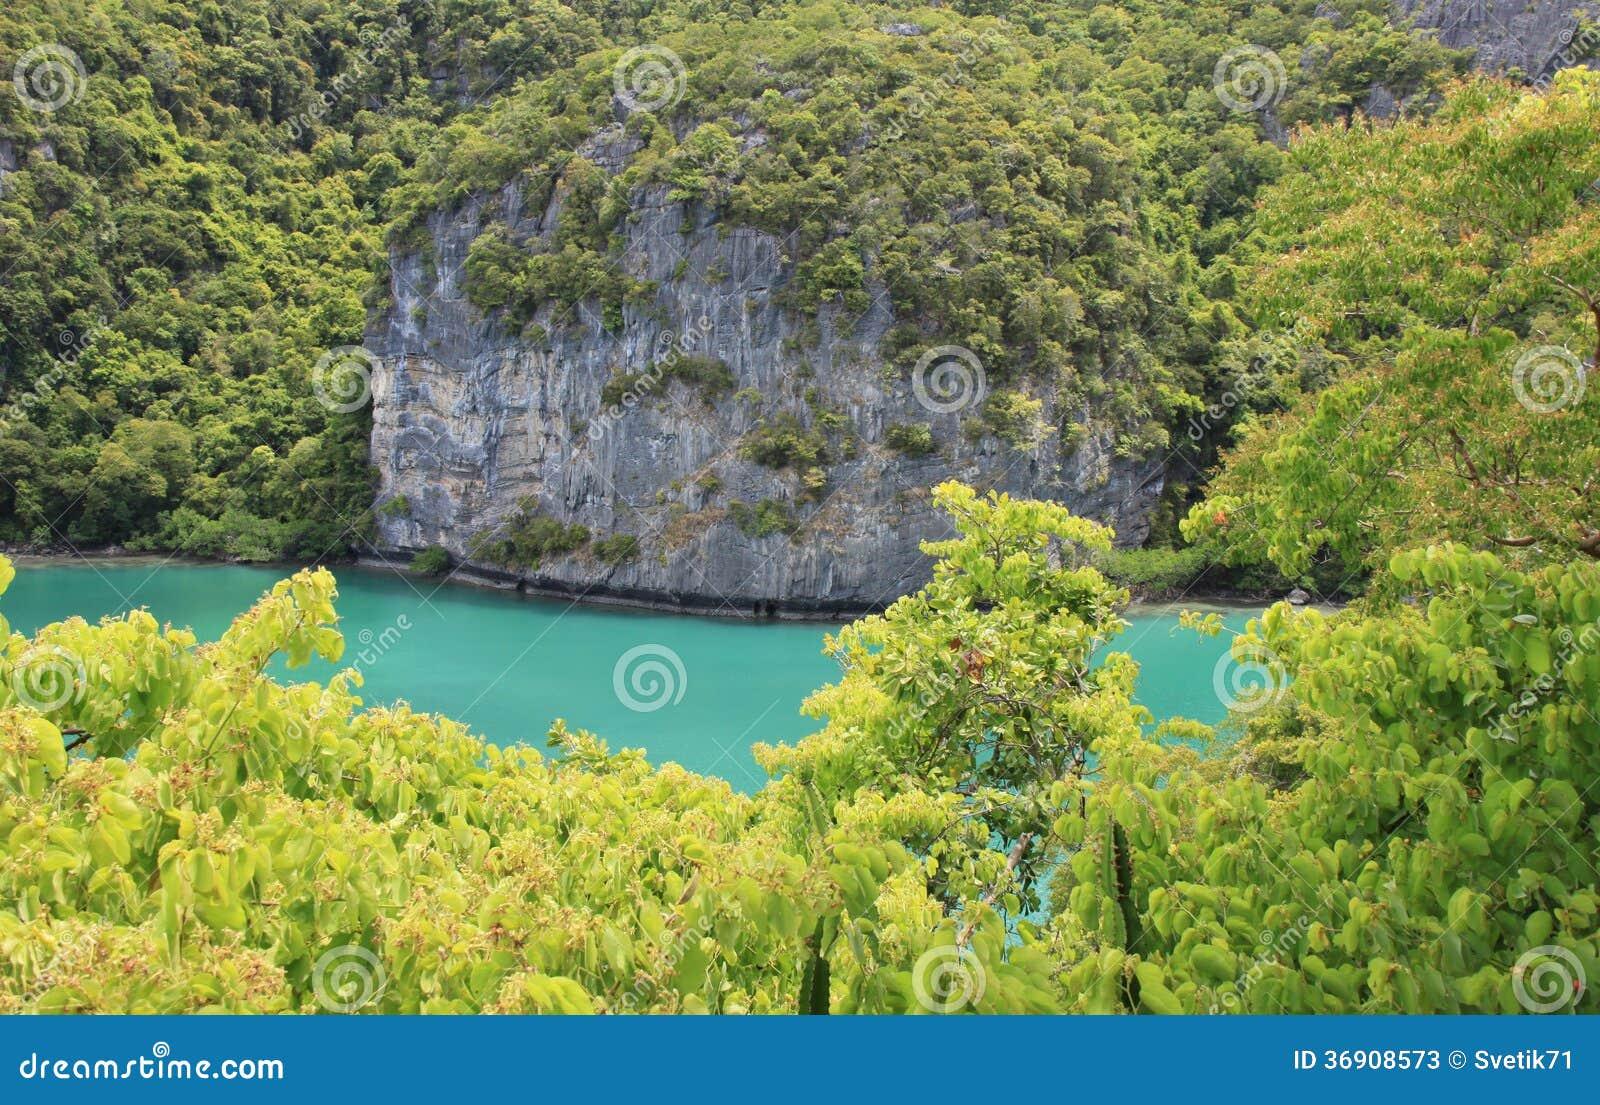 Zielona natura na dennym tle